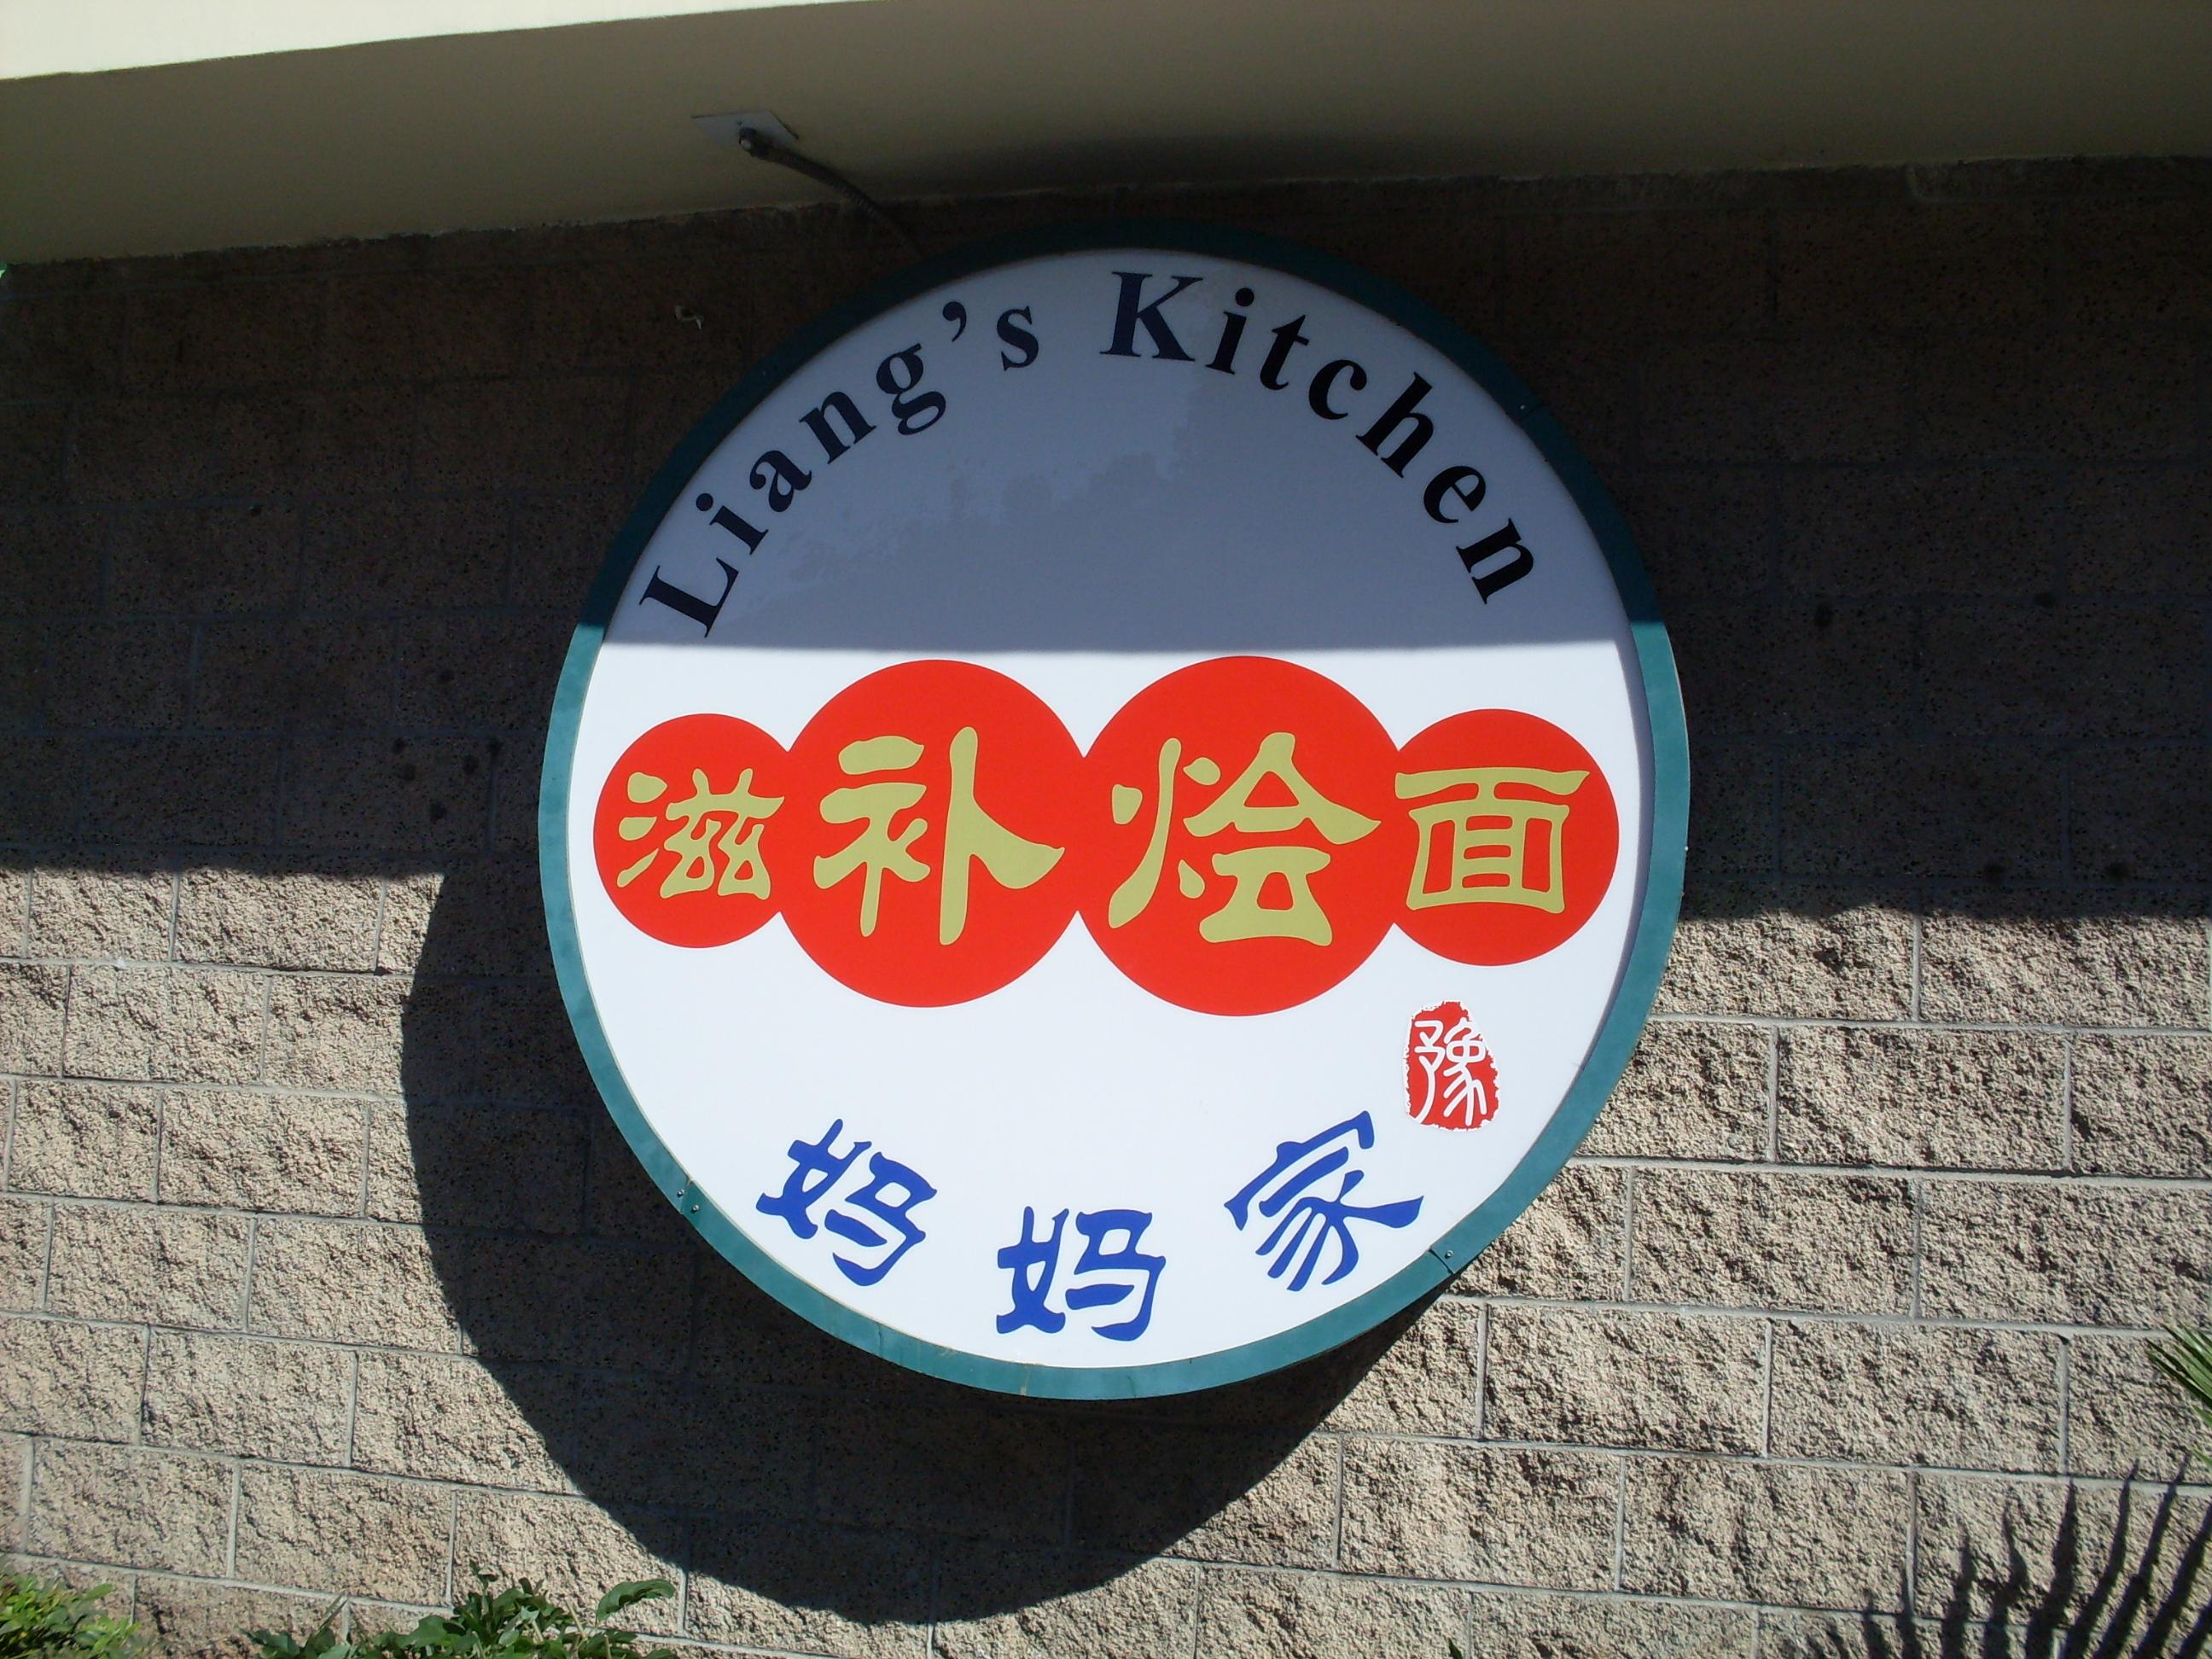 Liang S Kitchen Monterey Park